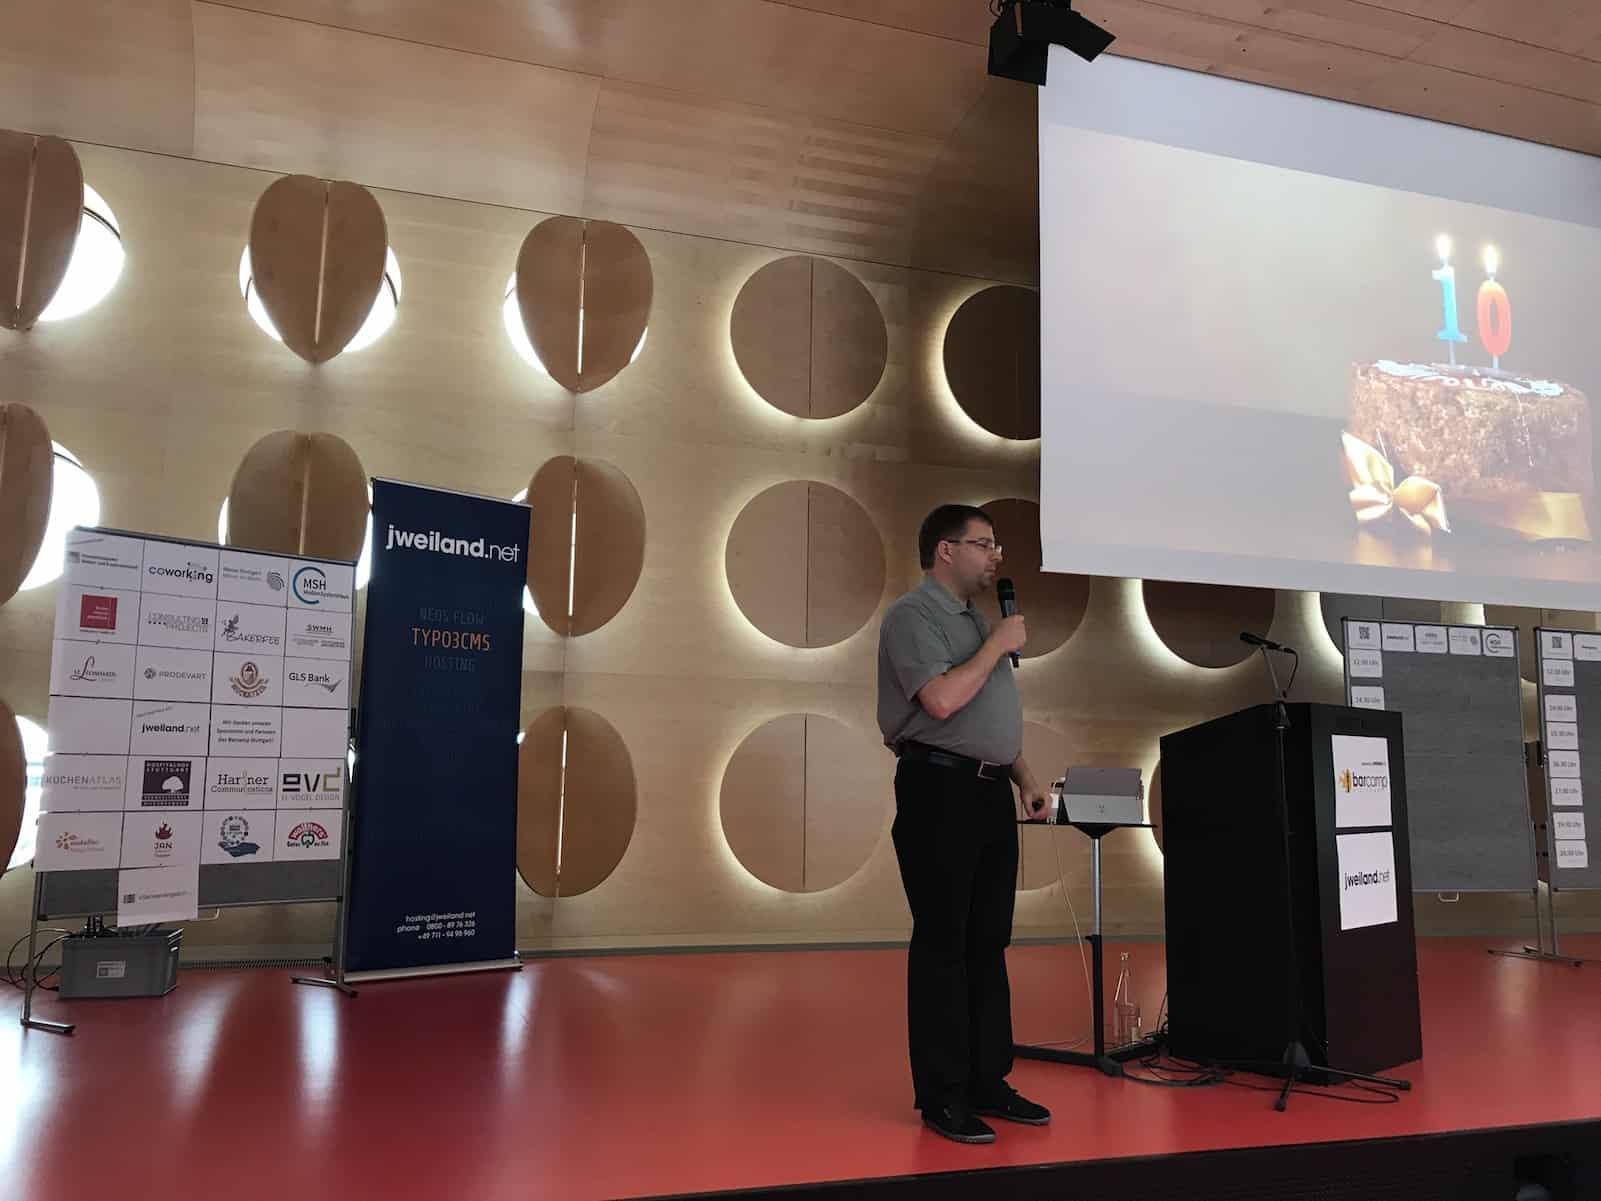 Jan Theofel eröffnet das Jubiläums Barcamp in Stuttgart 2017: Danke an die Sponsoren, links im Bild!